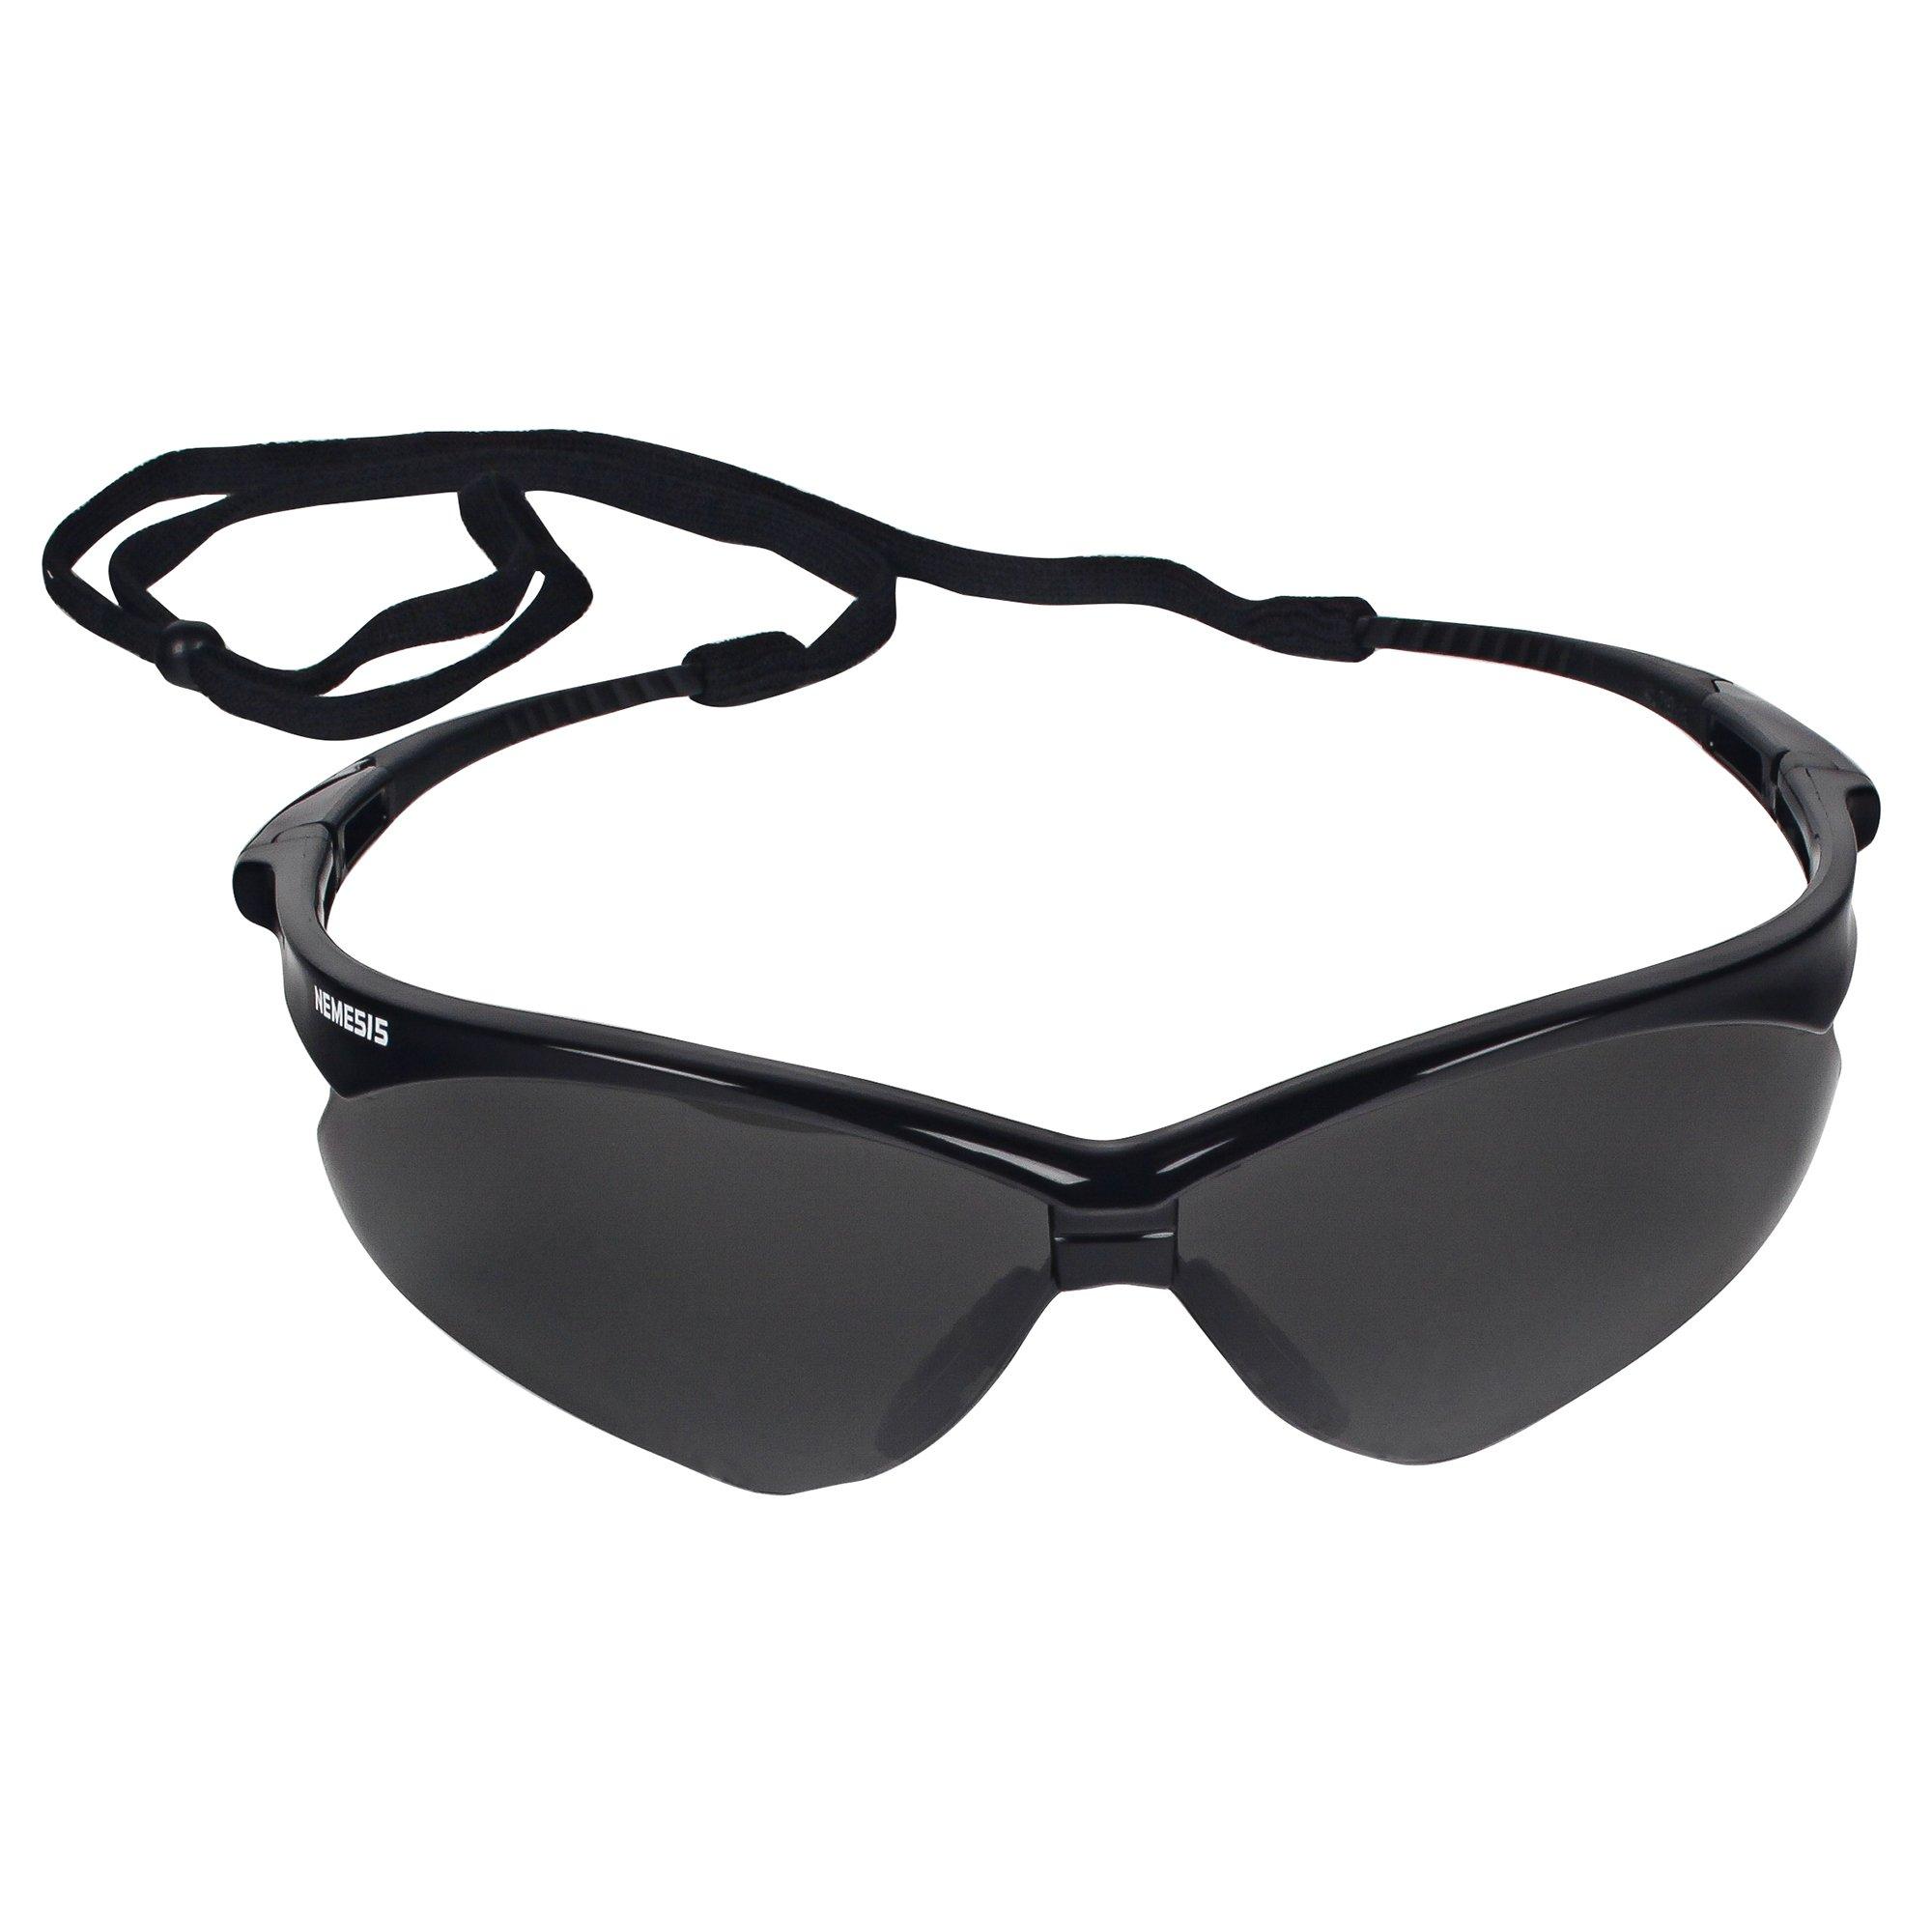 Jackson Safety V30 22475 Nemesis Safety Glasses 3020121 (3 Pair) (Black Frame with Smoke Anti-Fog Lens) by Jackson Nemesis (Image #3)